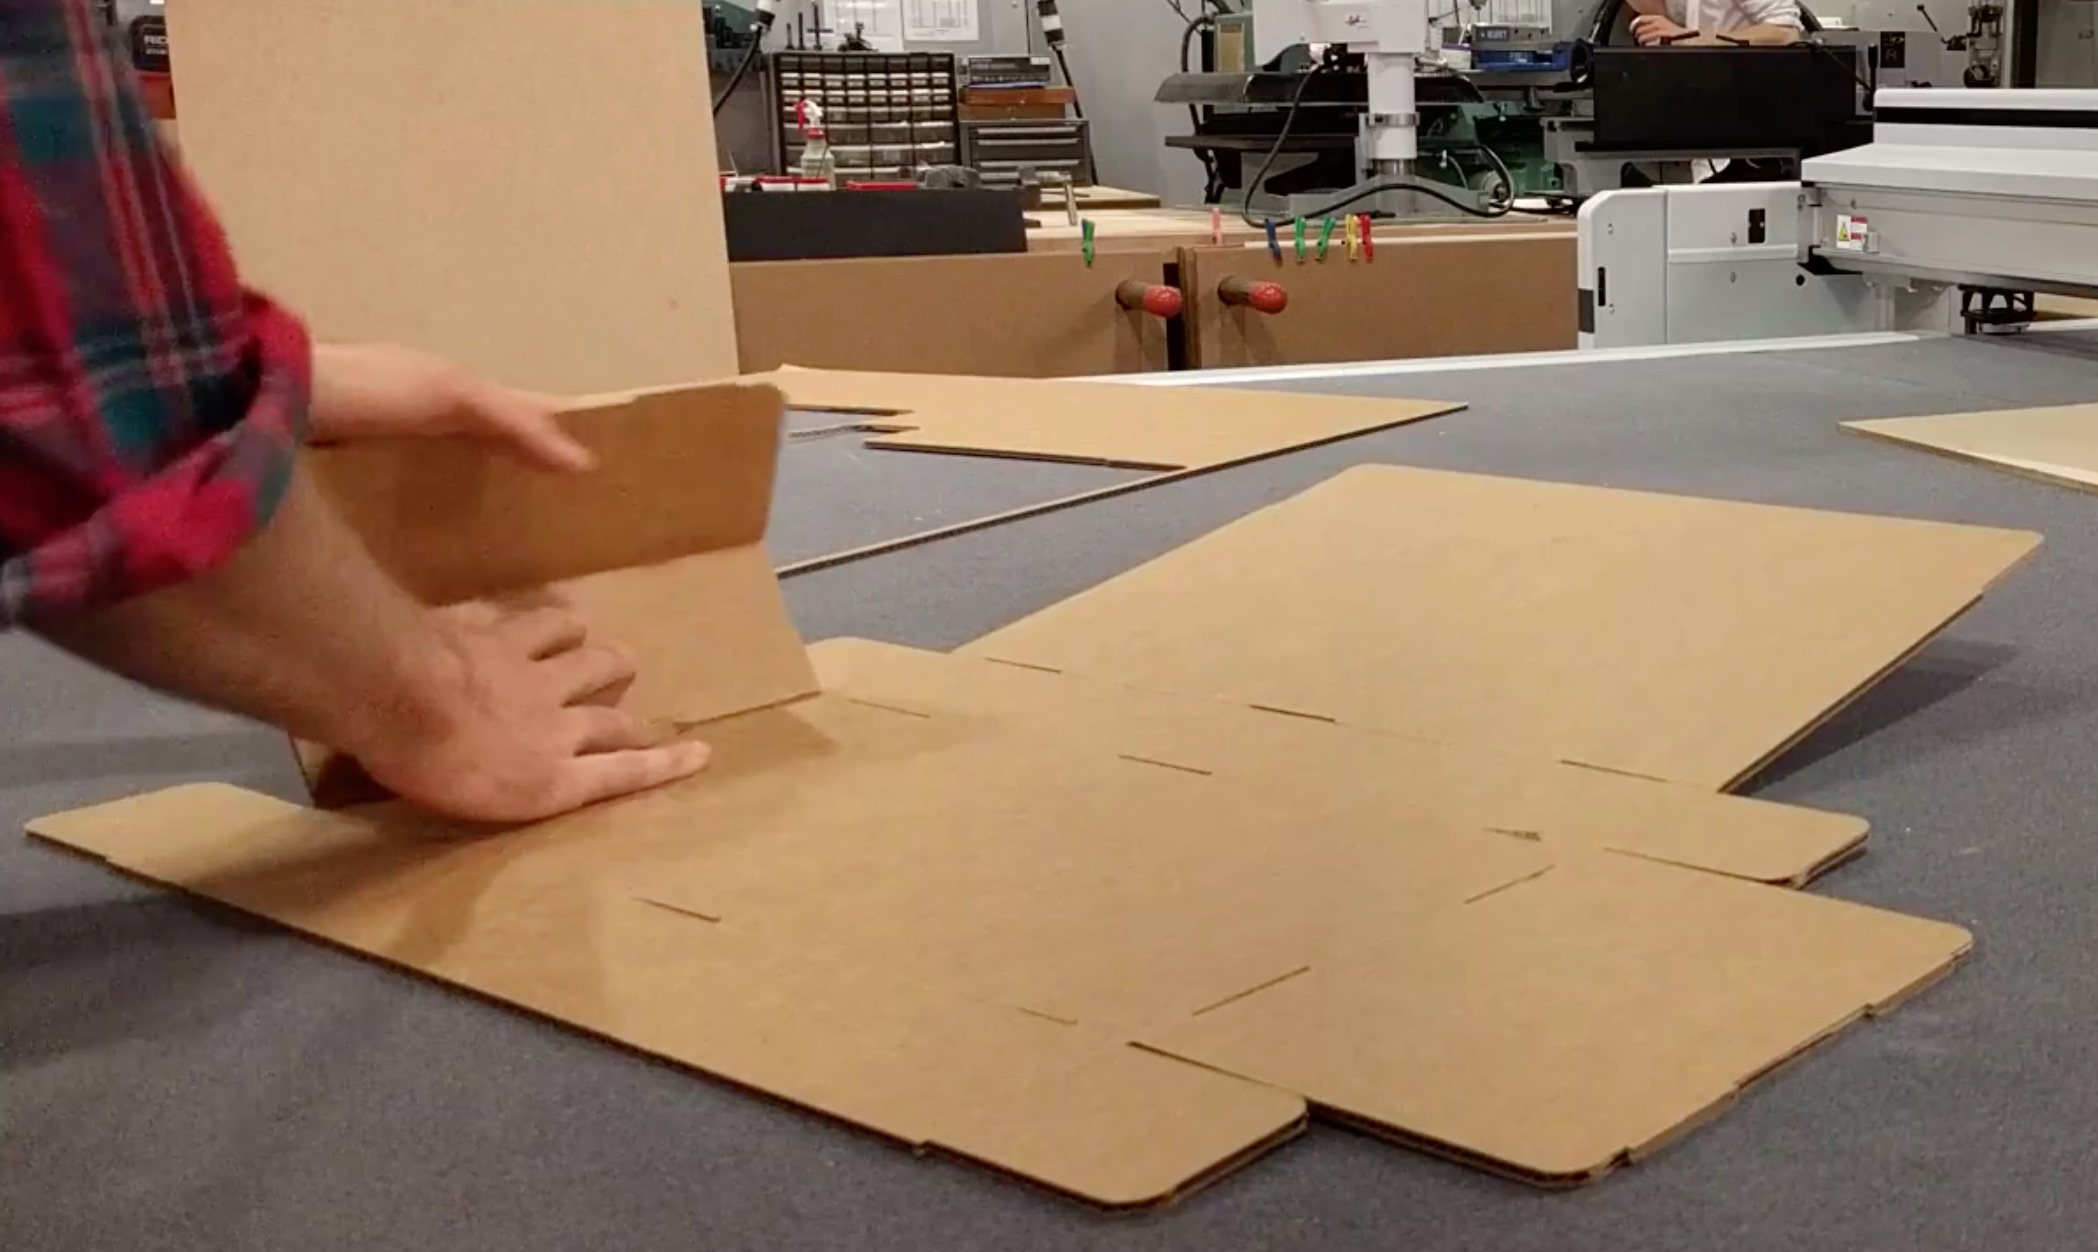 img/cardboard-2.jpg